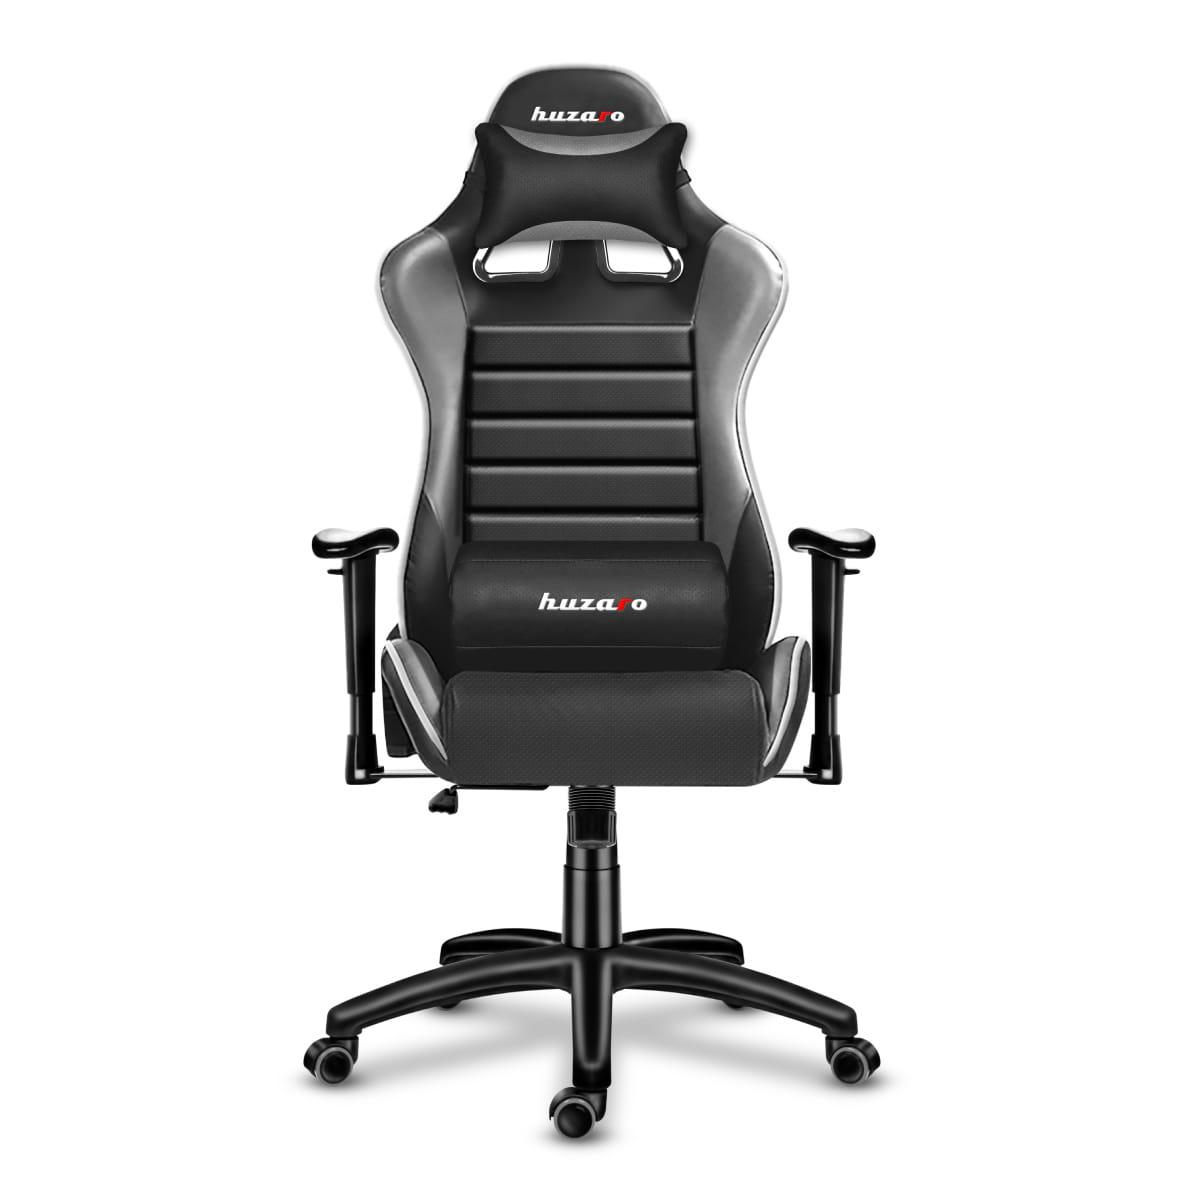 Комп'ютерне крісло для геймера Huzaro Force 6.0 black-grey